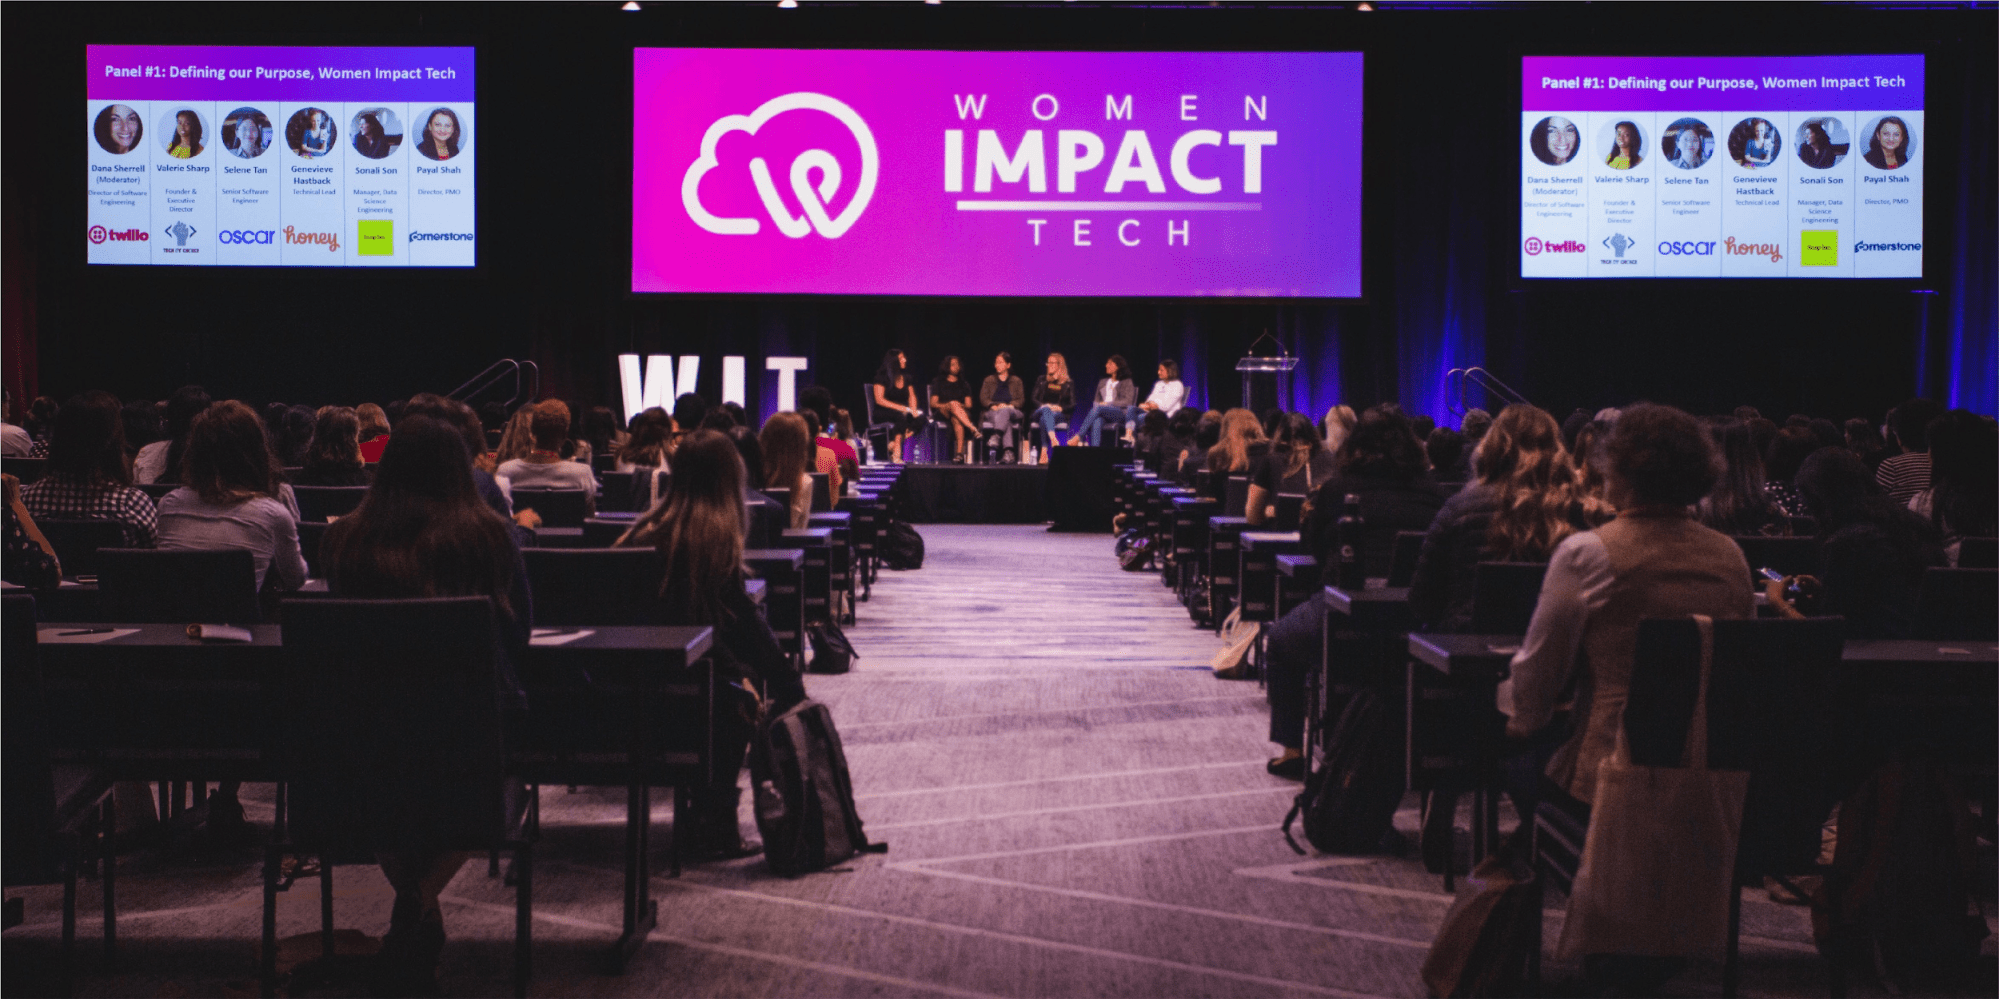 Women Impact Tech - Women's Conference